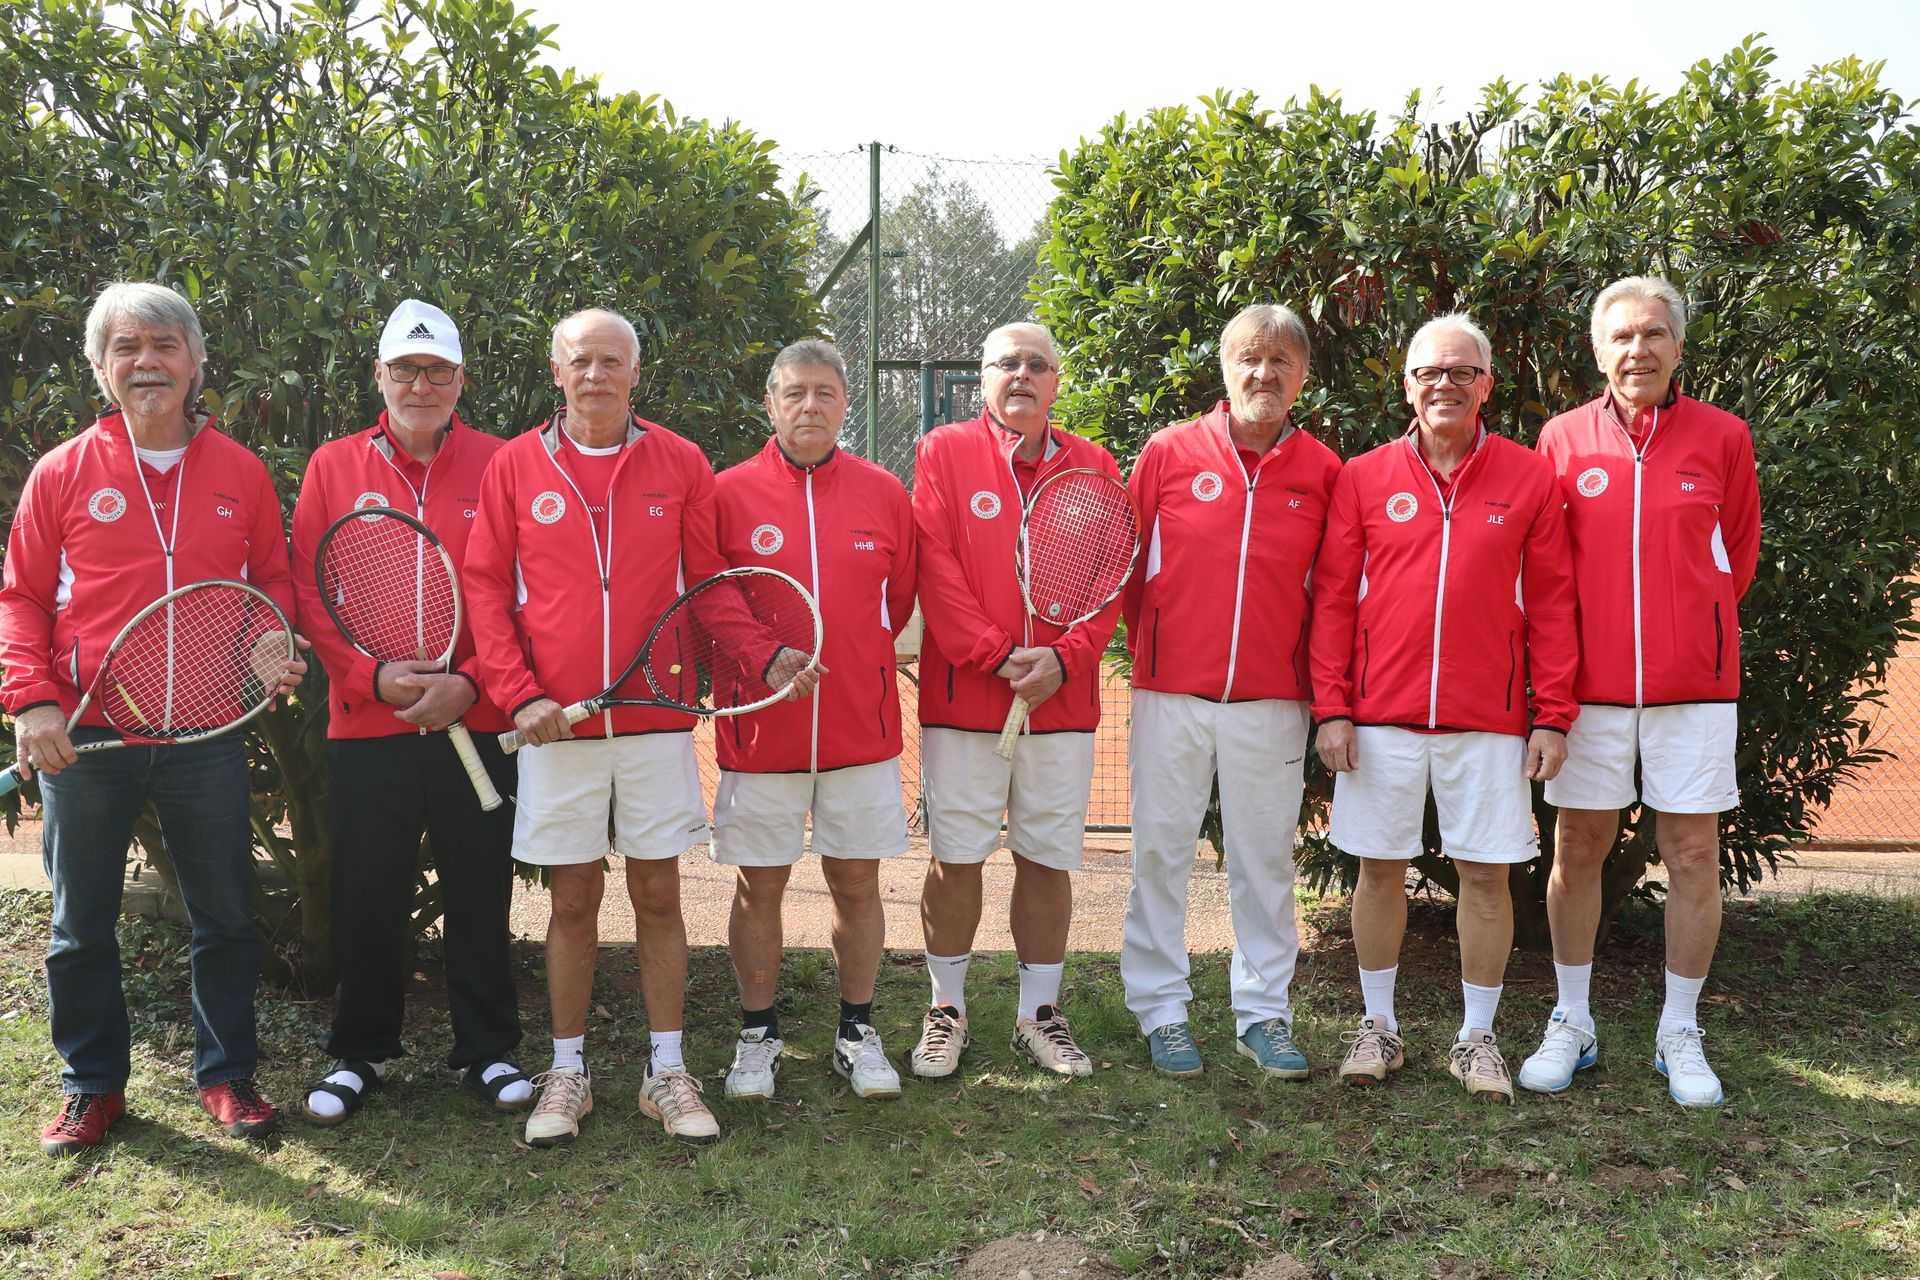 Tennisverein Kenzingen manschafte 15